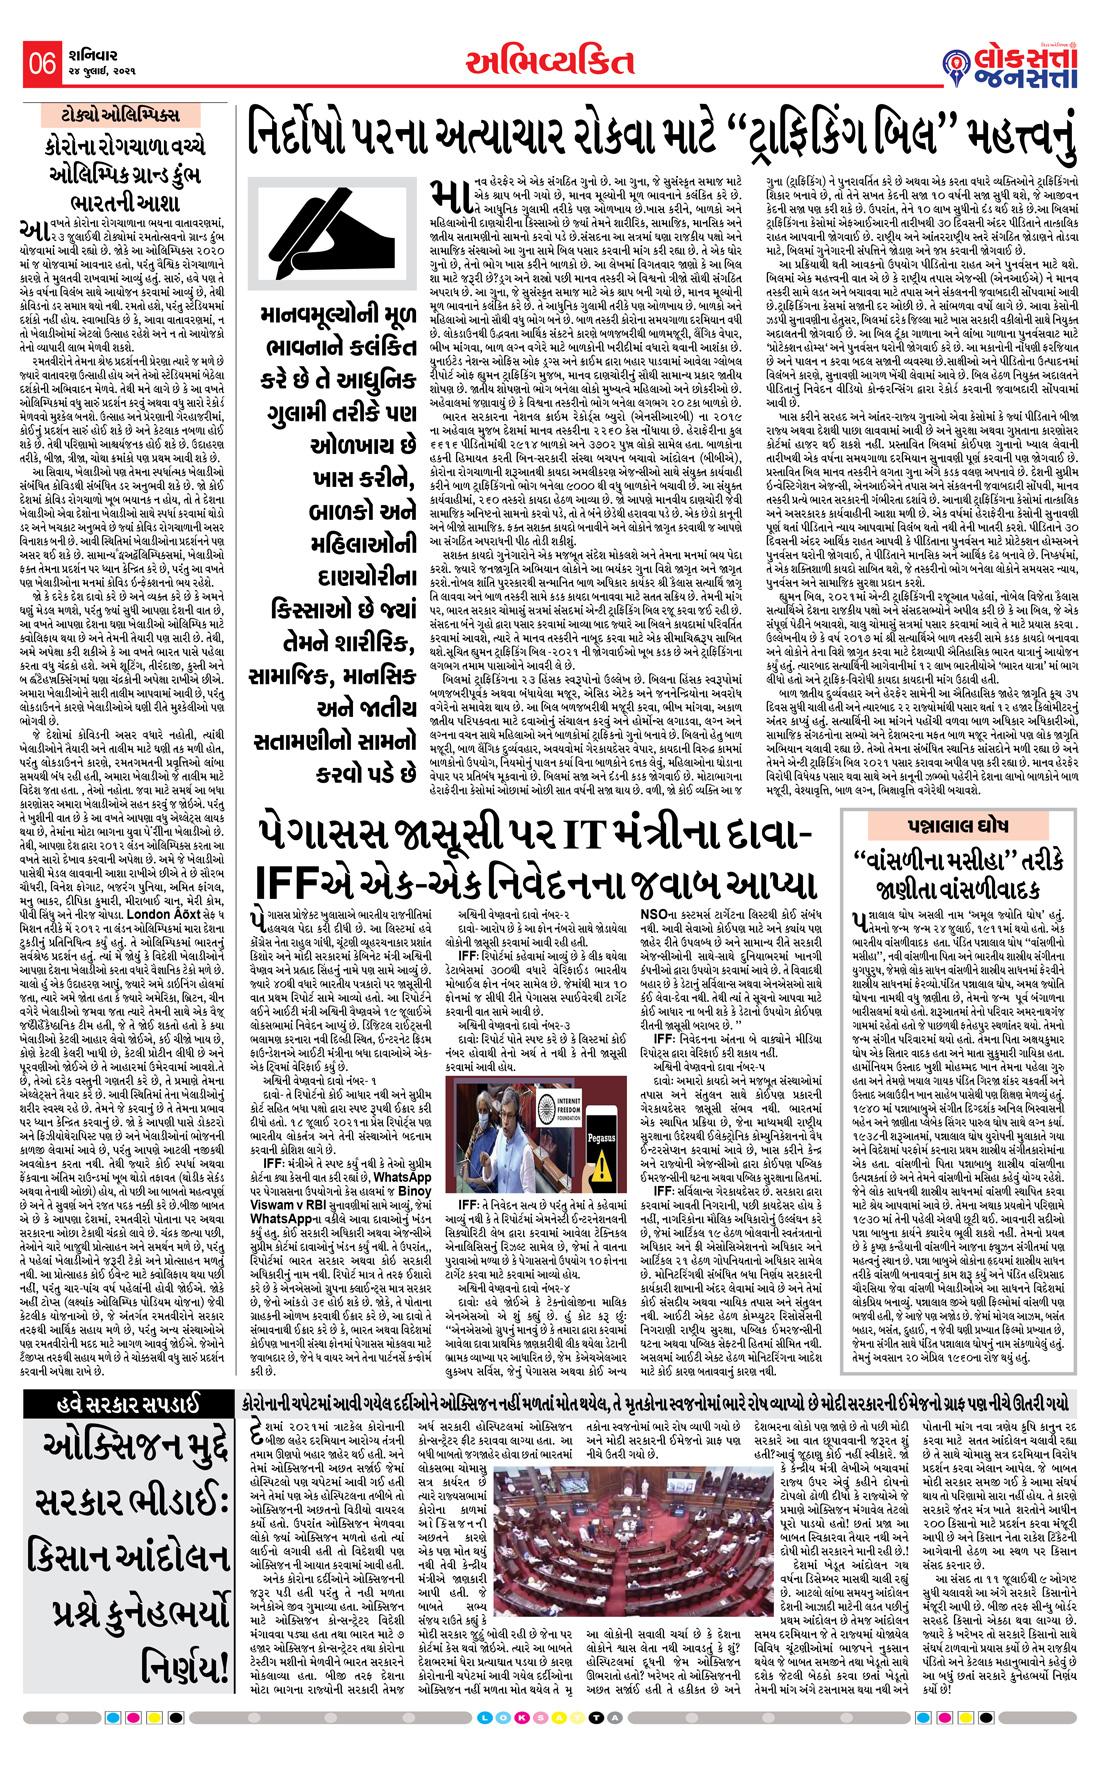 Loksatta Jansatta News Papaer E-paper dated 2021-07-24 | Page 6